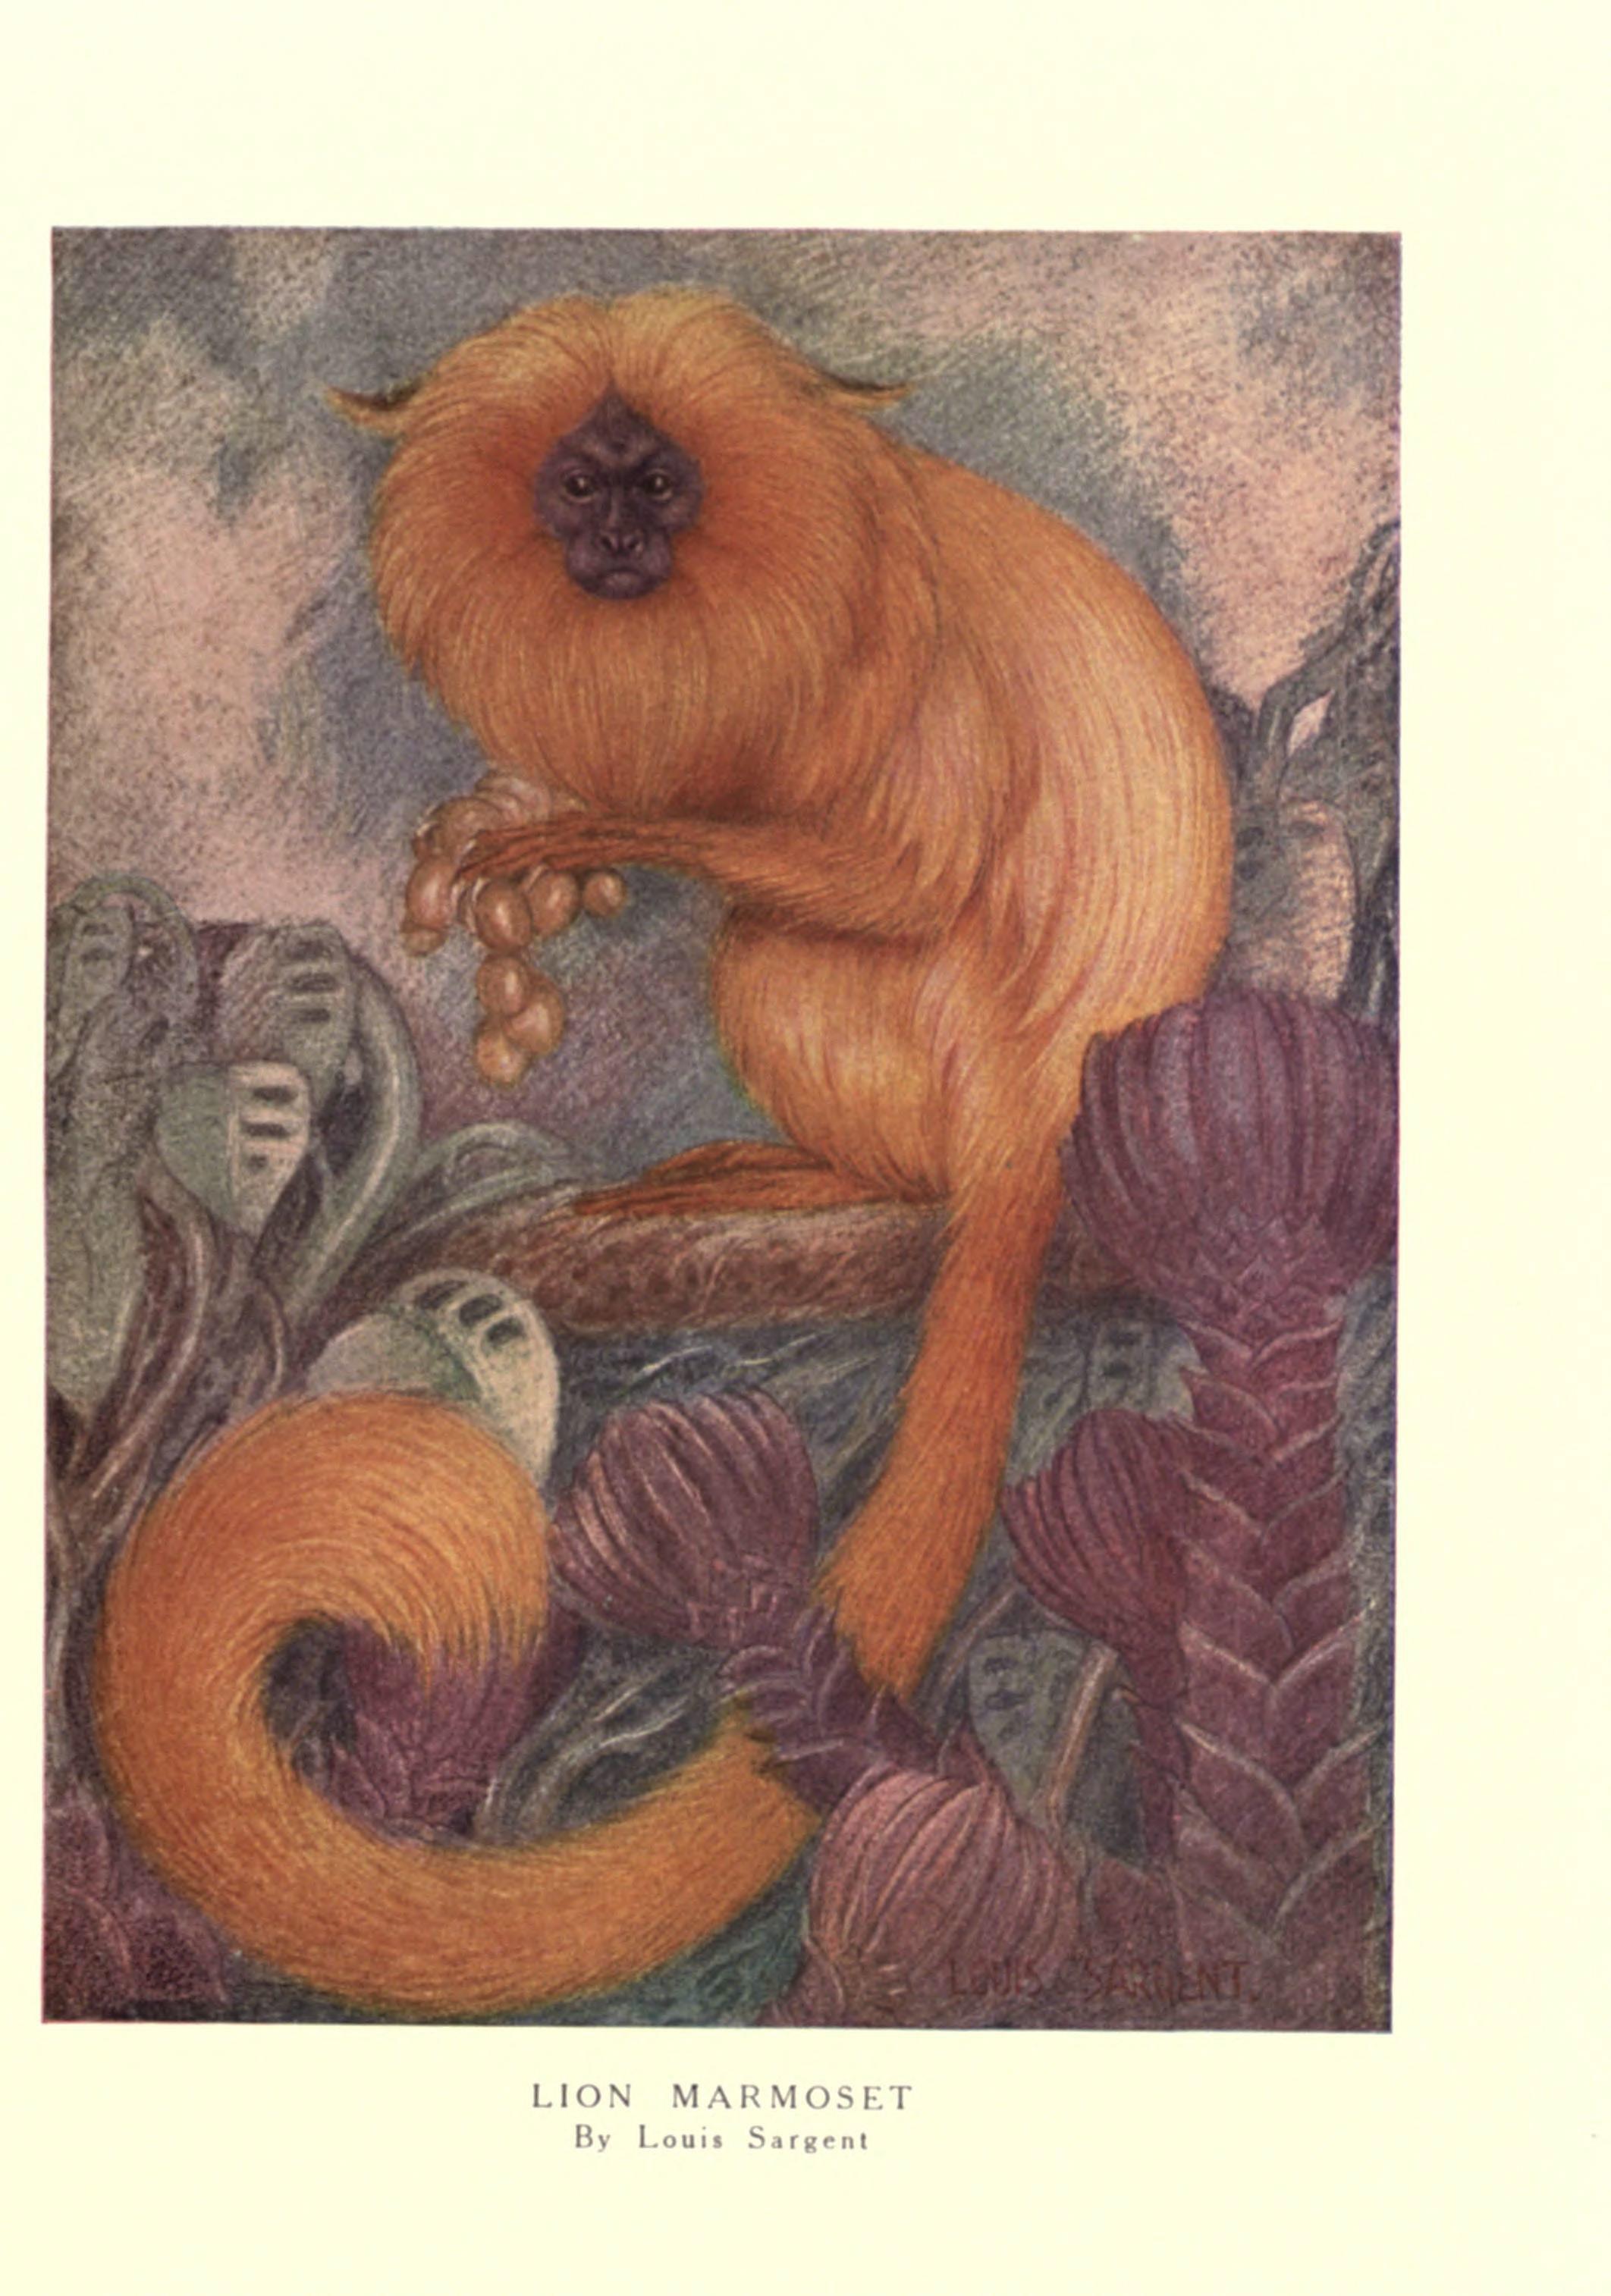 Image of Golden Lion Tamarin